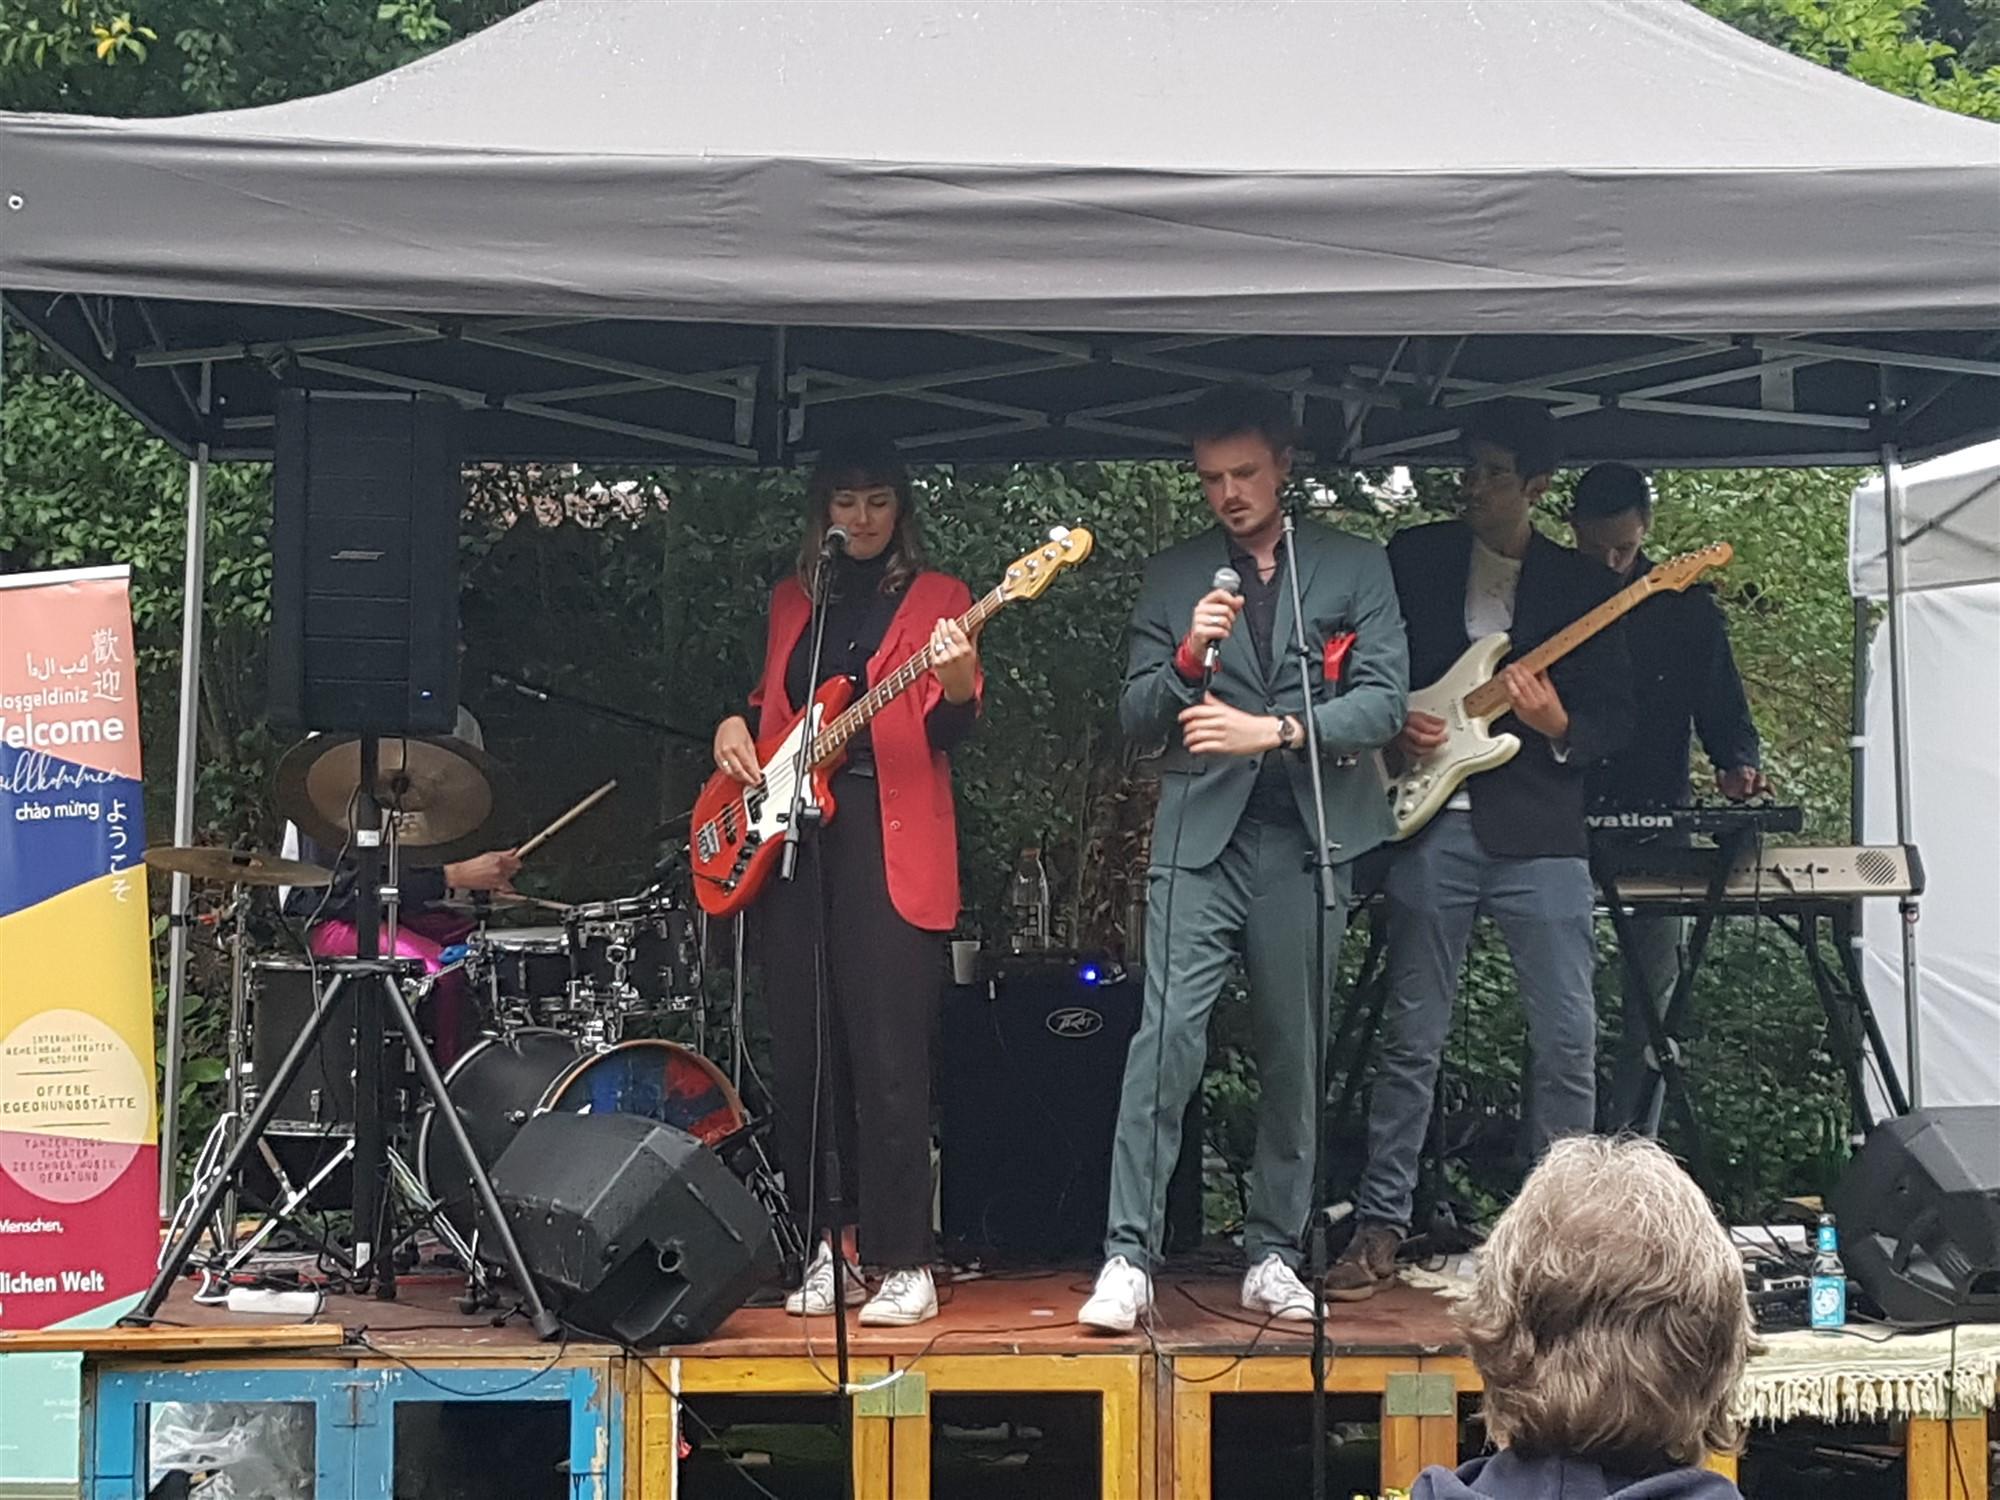 2021-08-28_Rathausgarten-Sommerfestival (15)